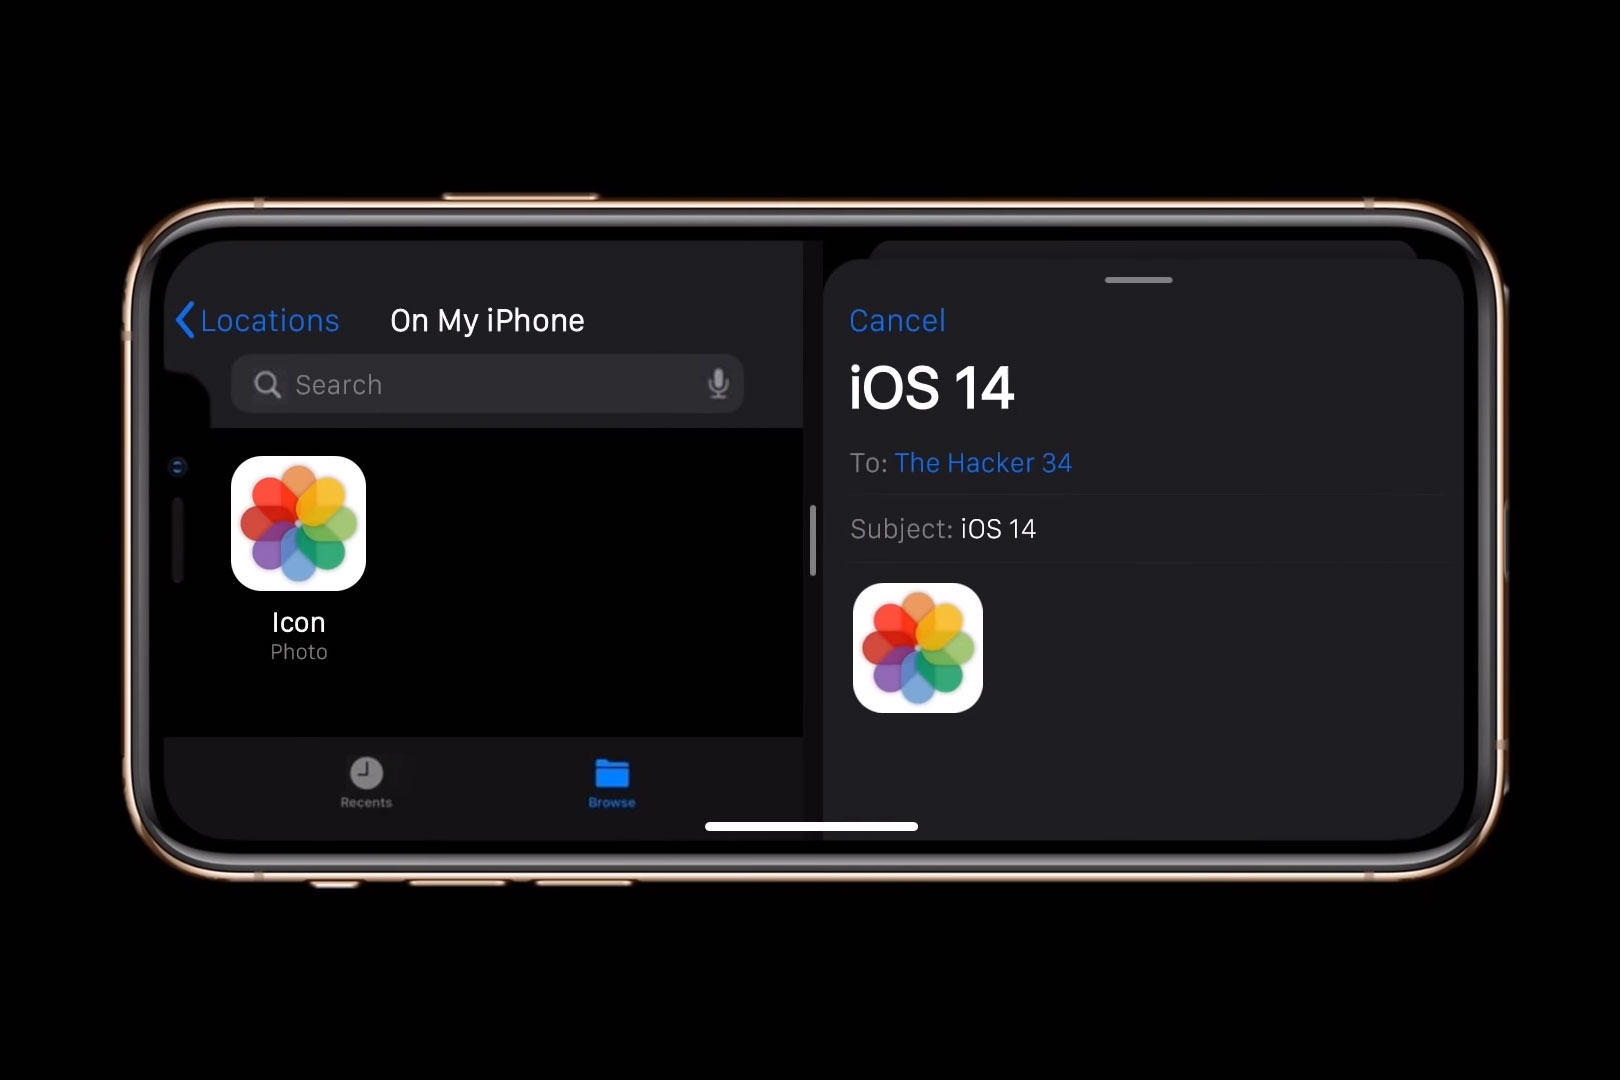 iOS 14细节曝光:可自由更换壁纸、Apple Pay或集成支付宝